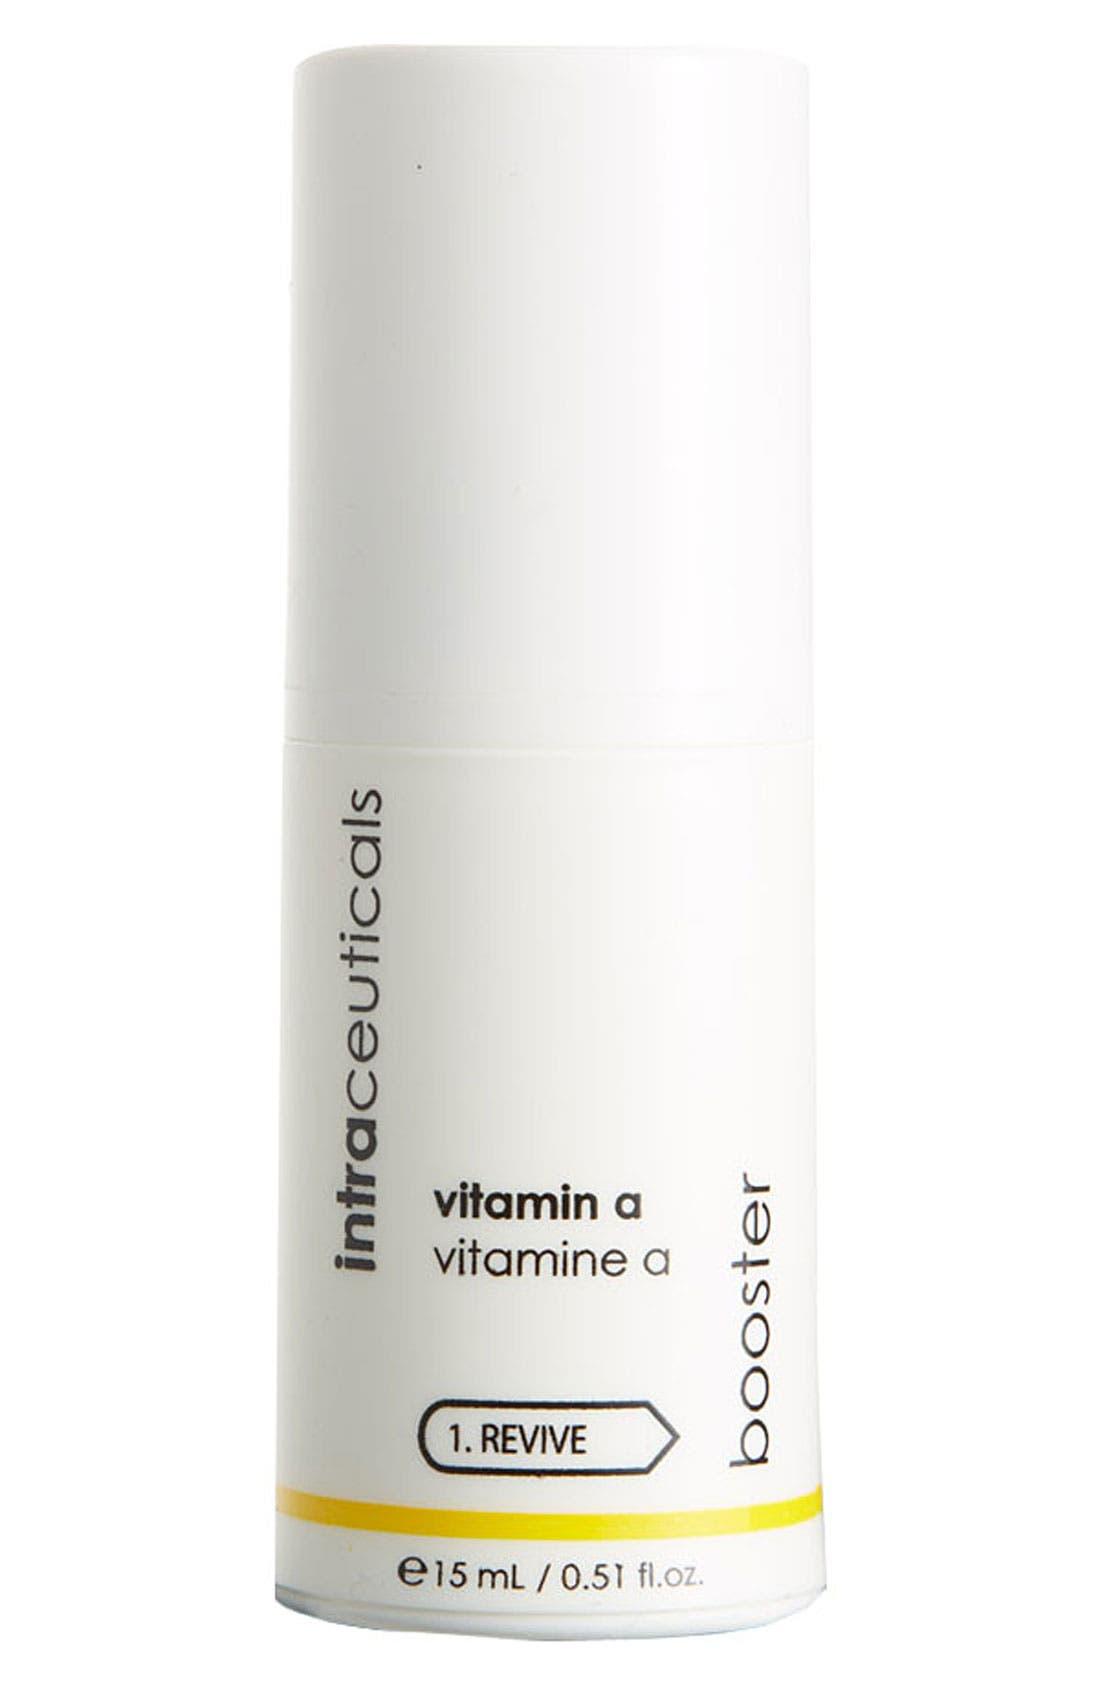 'Booster' Vitamin A Serum,                         Main,                         color, 000